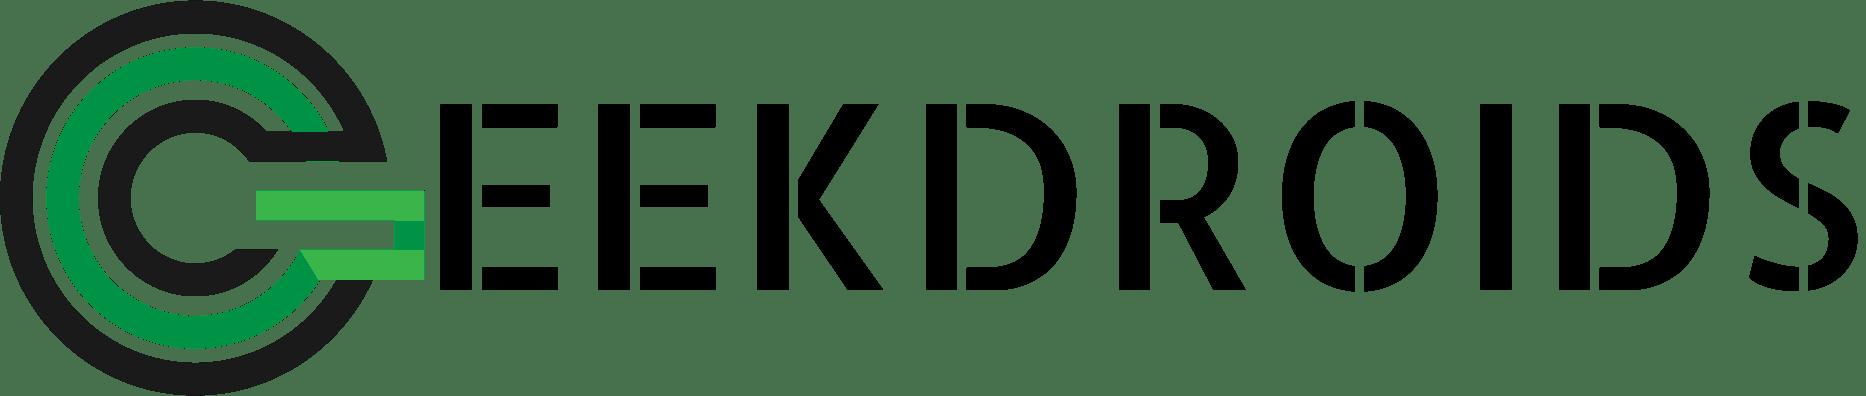 Geekdroids-logo